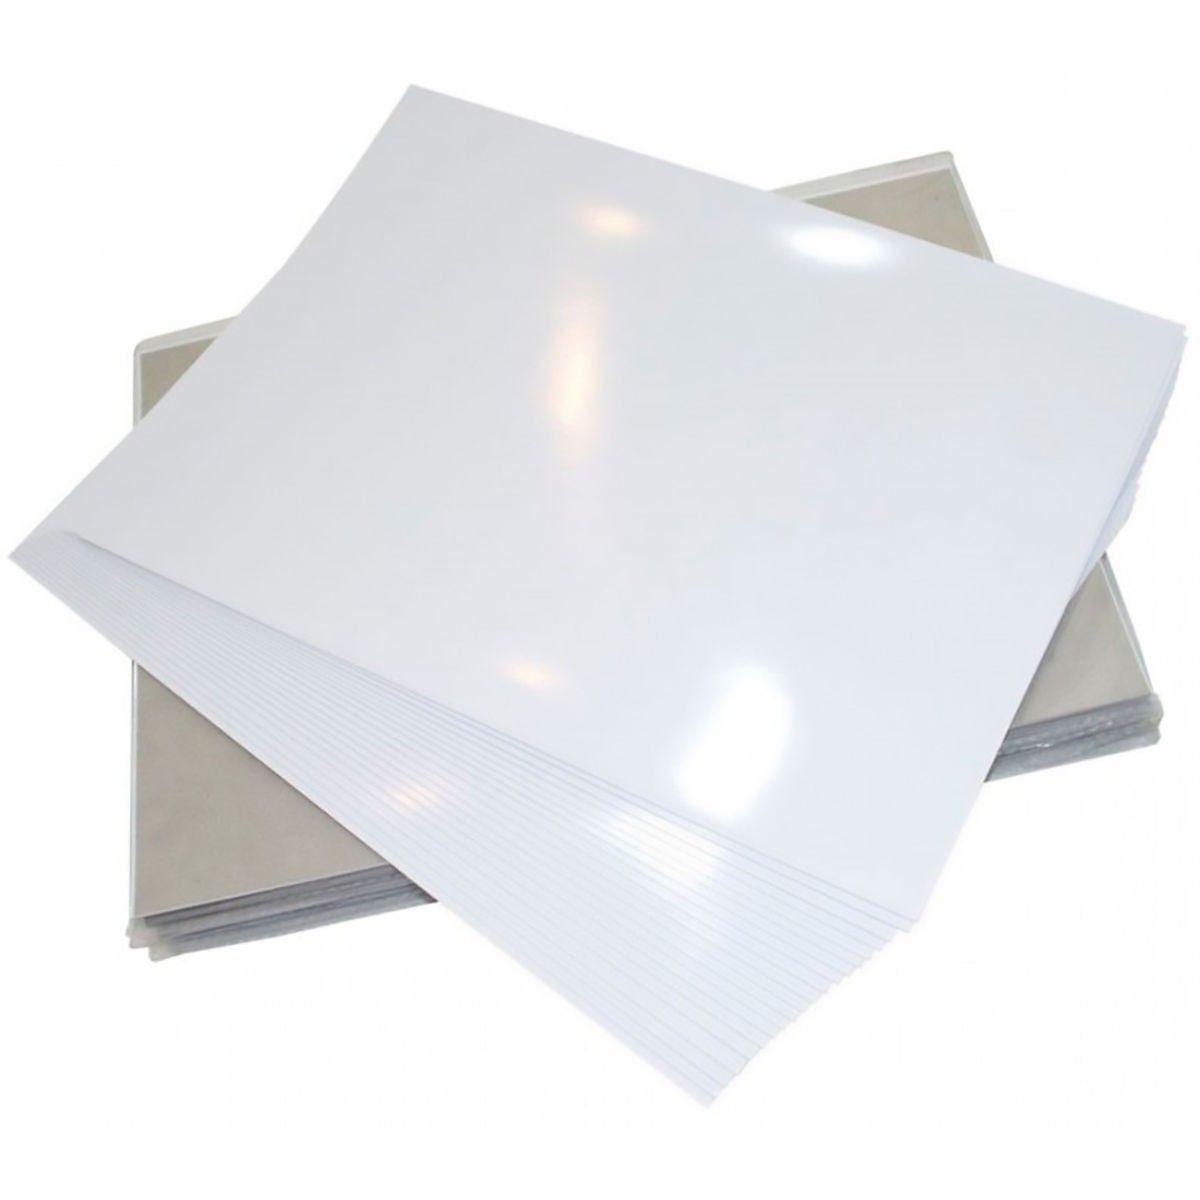 Papel Fotográfico A4 Dupla Face 180g Glossy Branco Brilhante Resistente à Água / 300 folhas